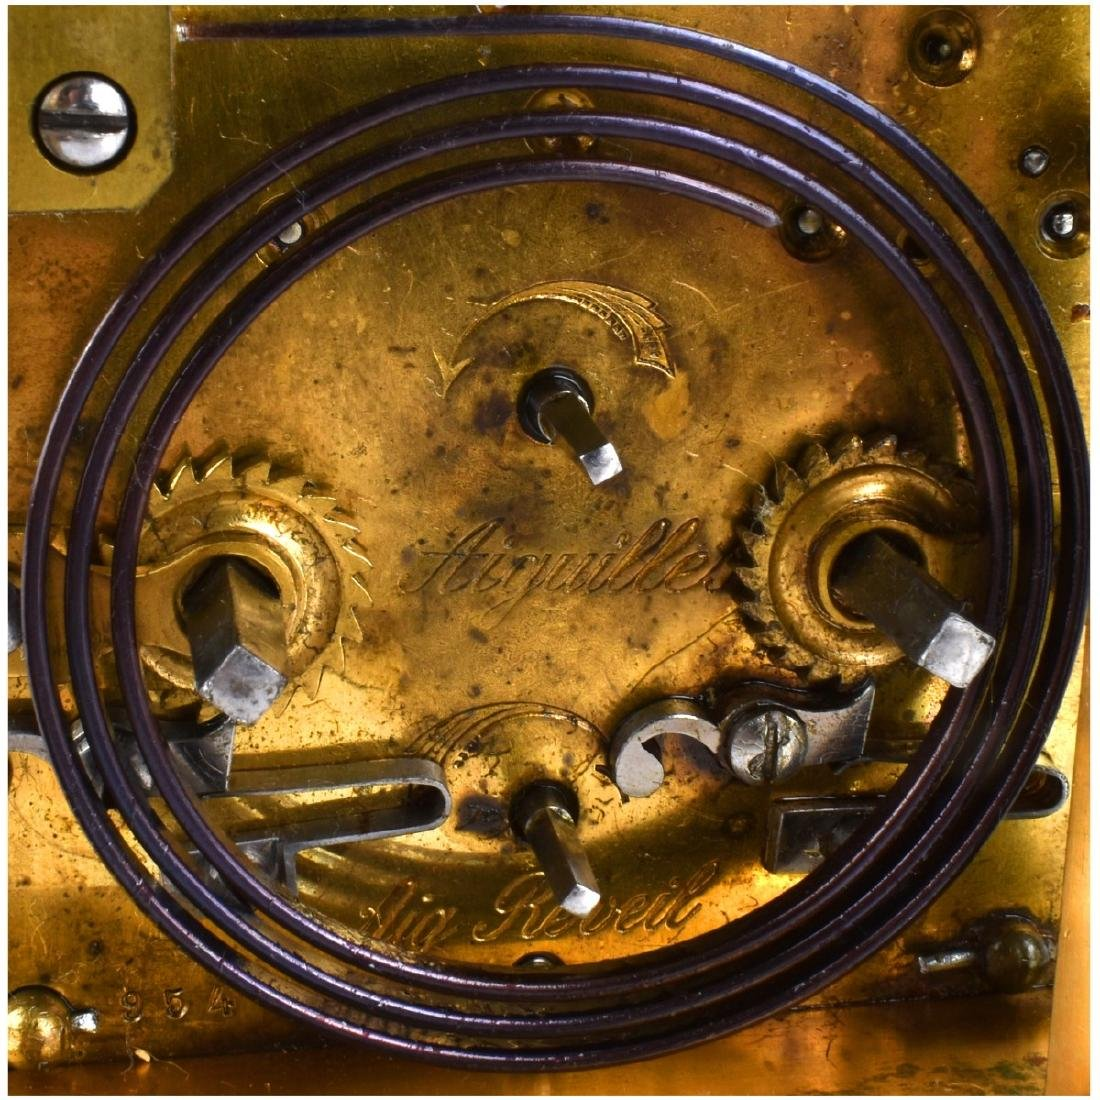 Antique Gilt Brass Carriage Clock - 6